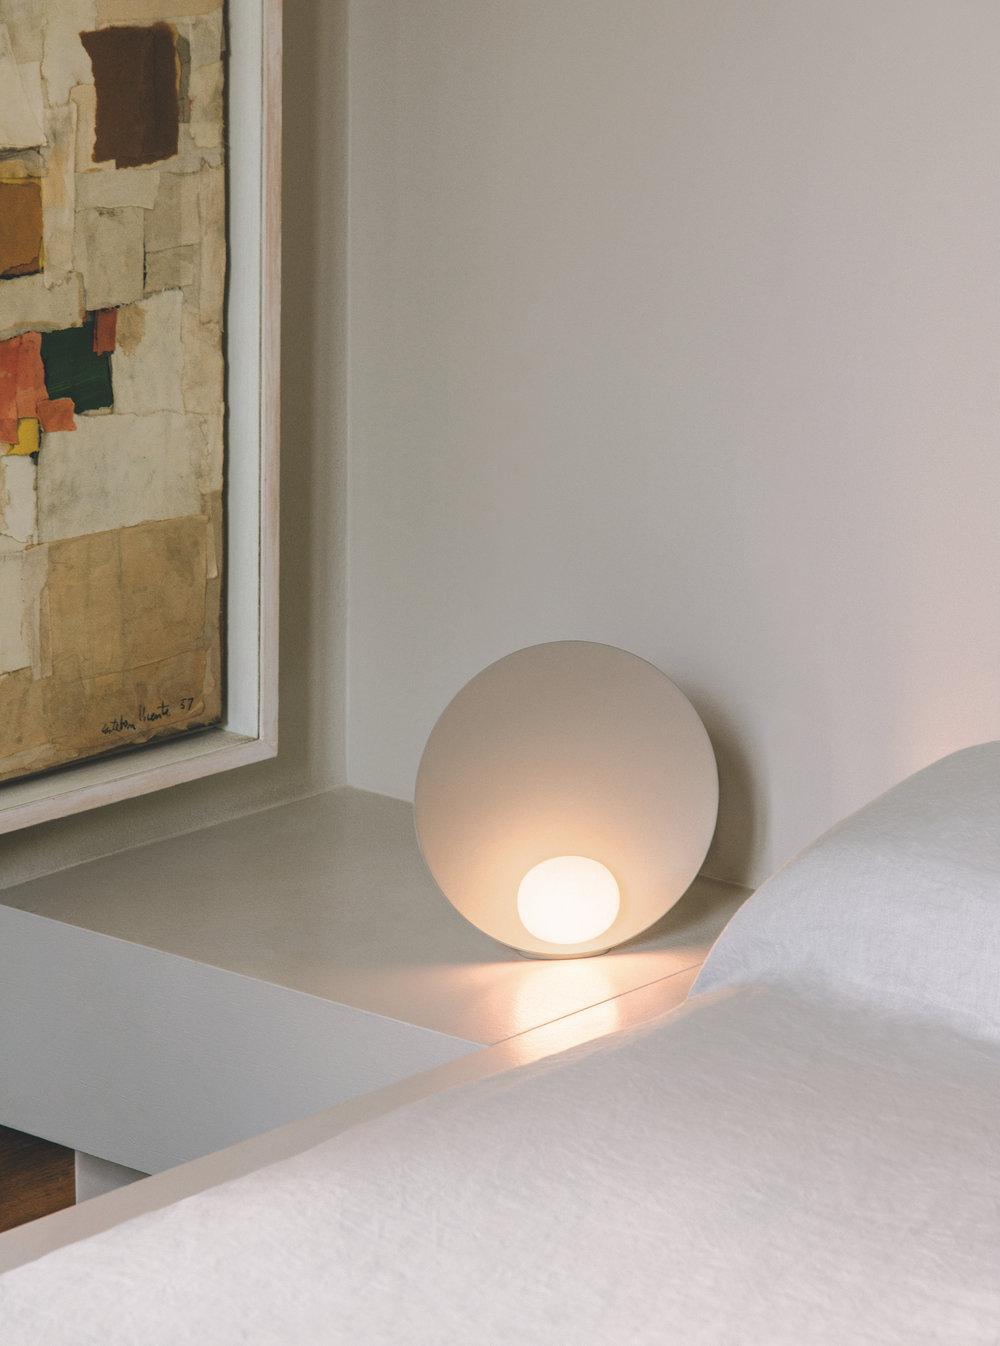 Musa Lamp designed by Note Design Studio